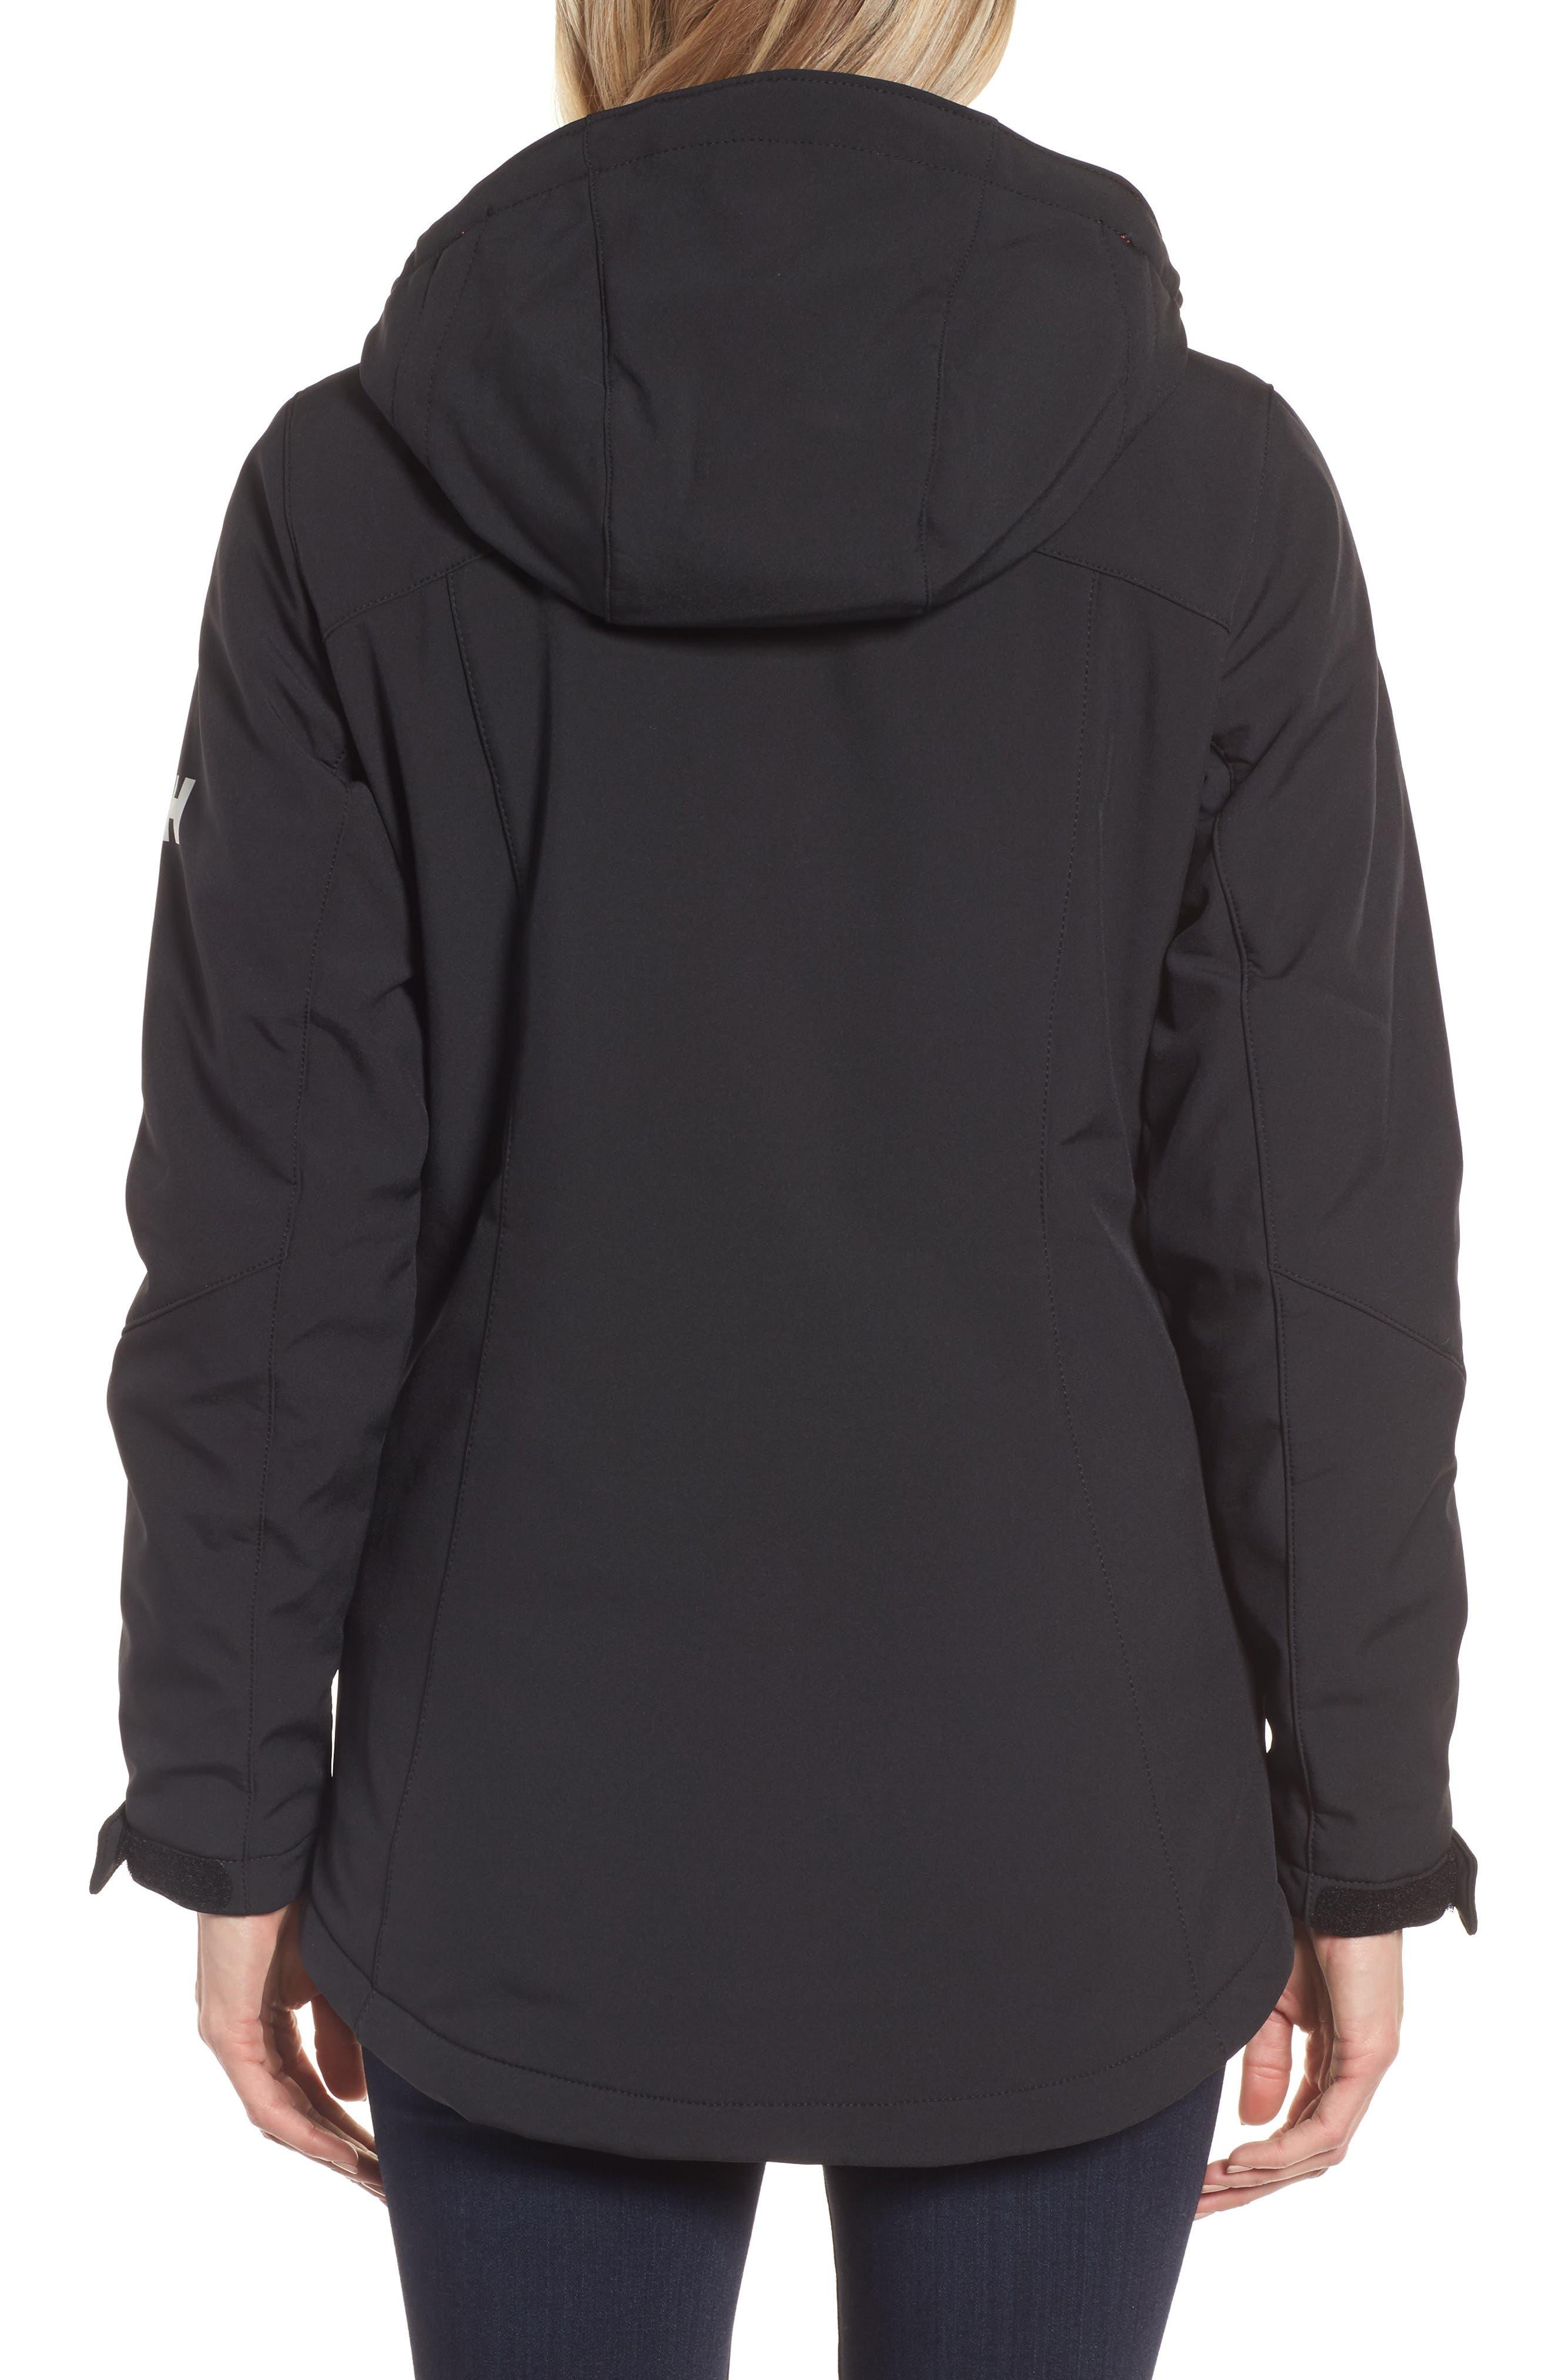 Lofn Hooded Insulated Soft Shell Jacket,                             Alternate thumbnail 2, color,                             Black